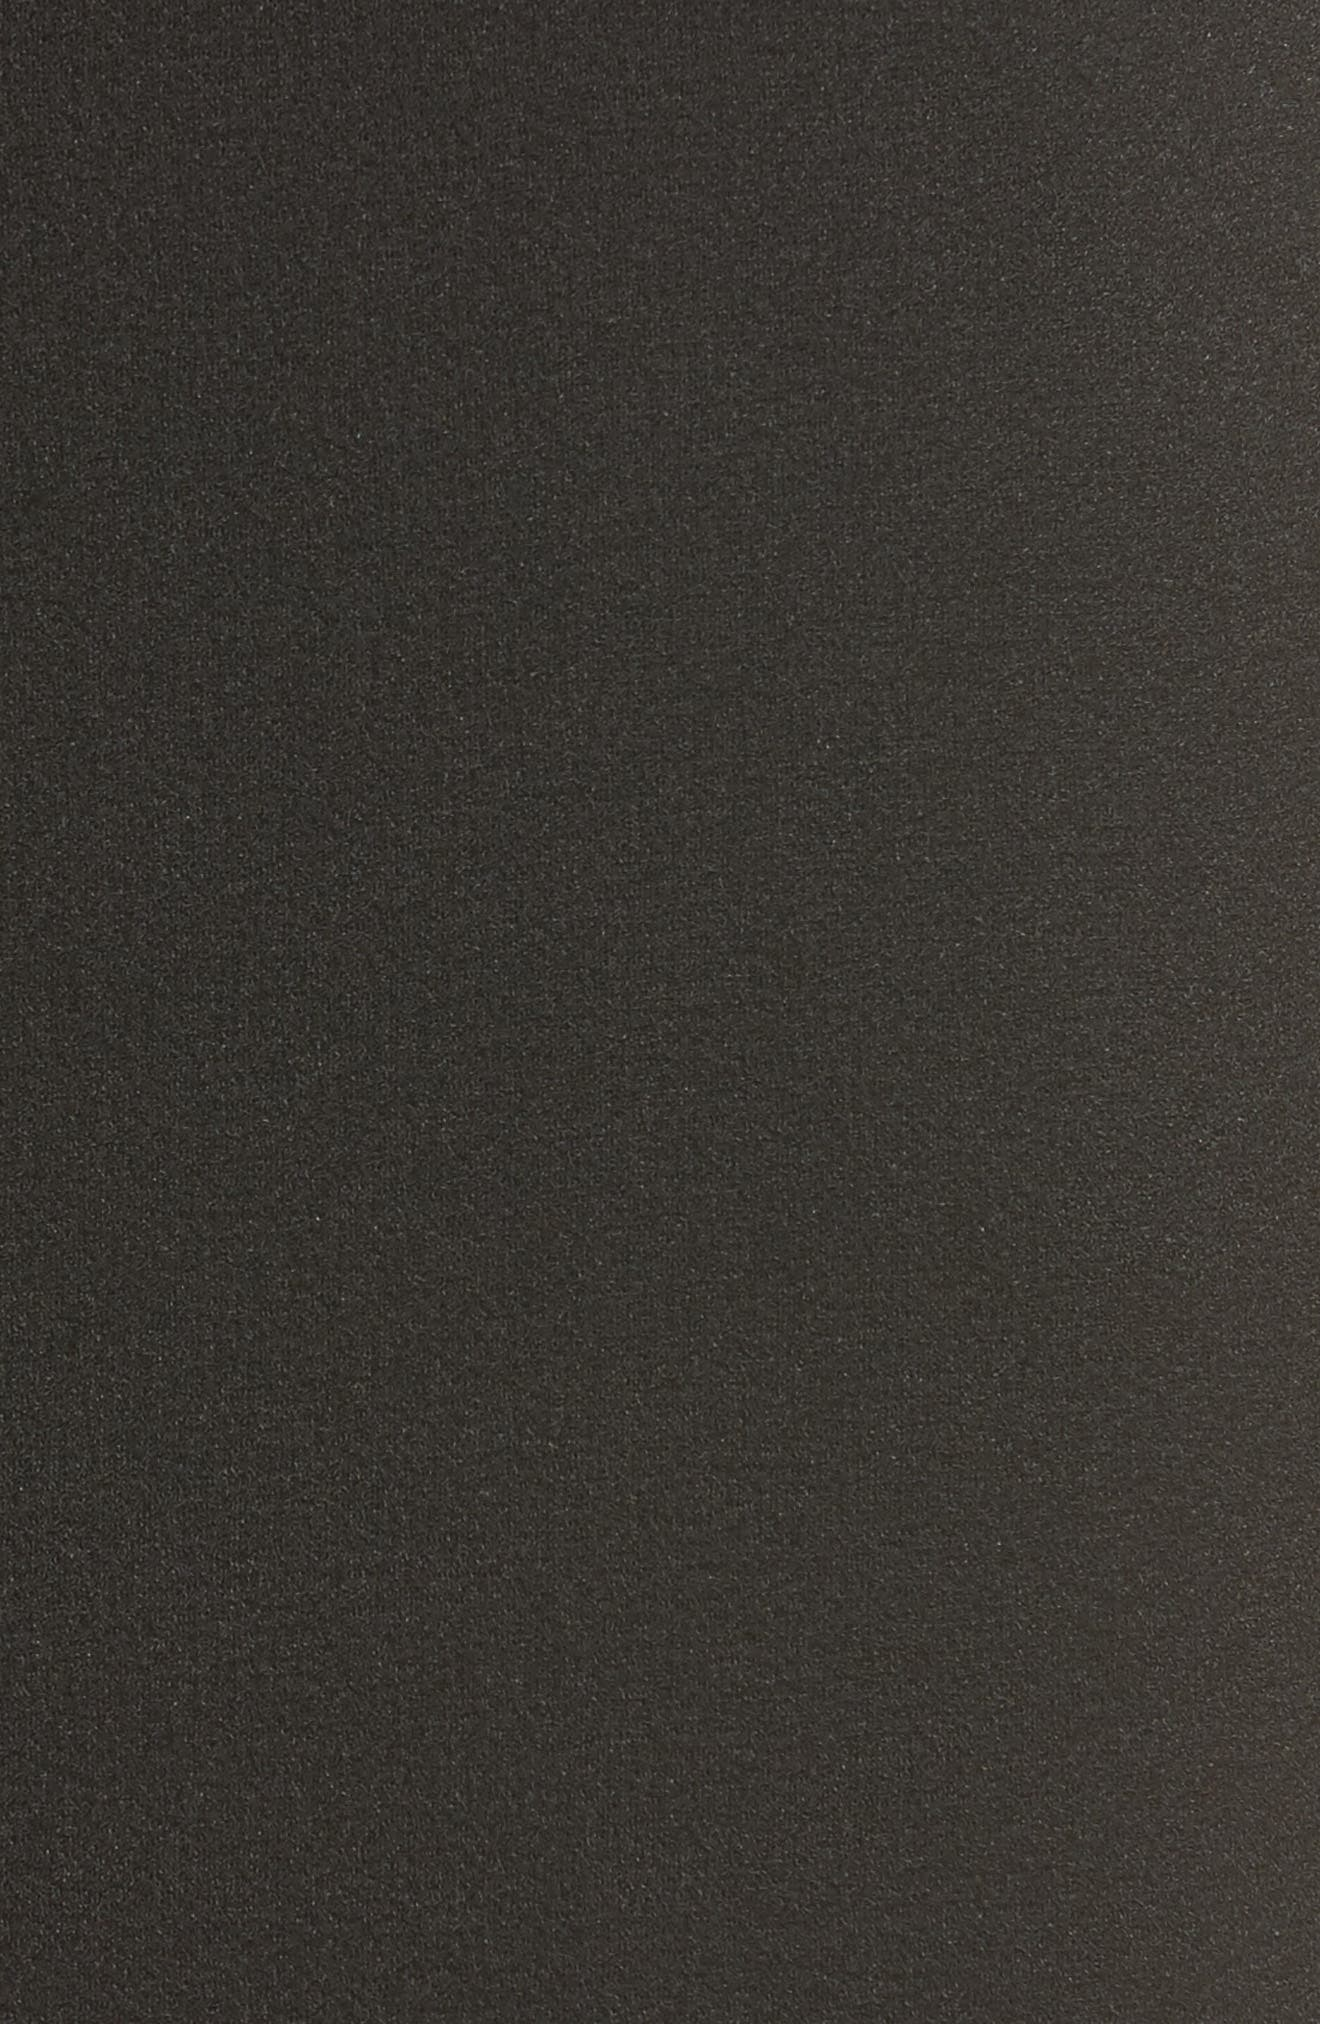 Hailey Crepe Dress,                             Alternate thumbnail 142, color,